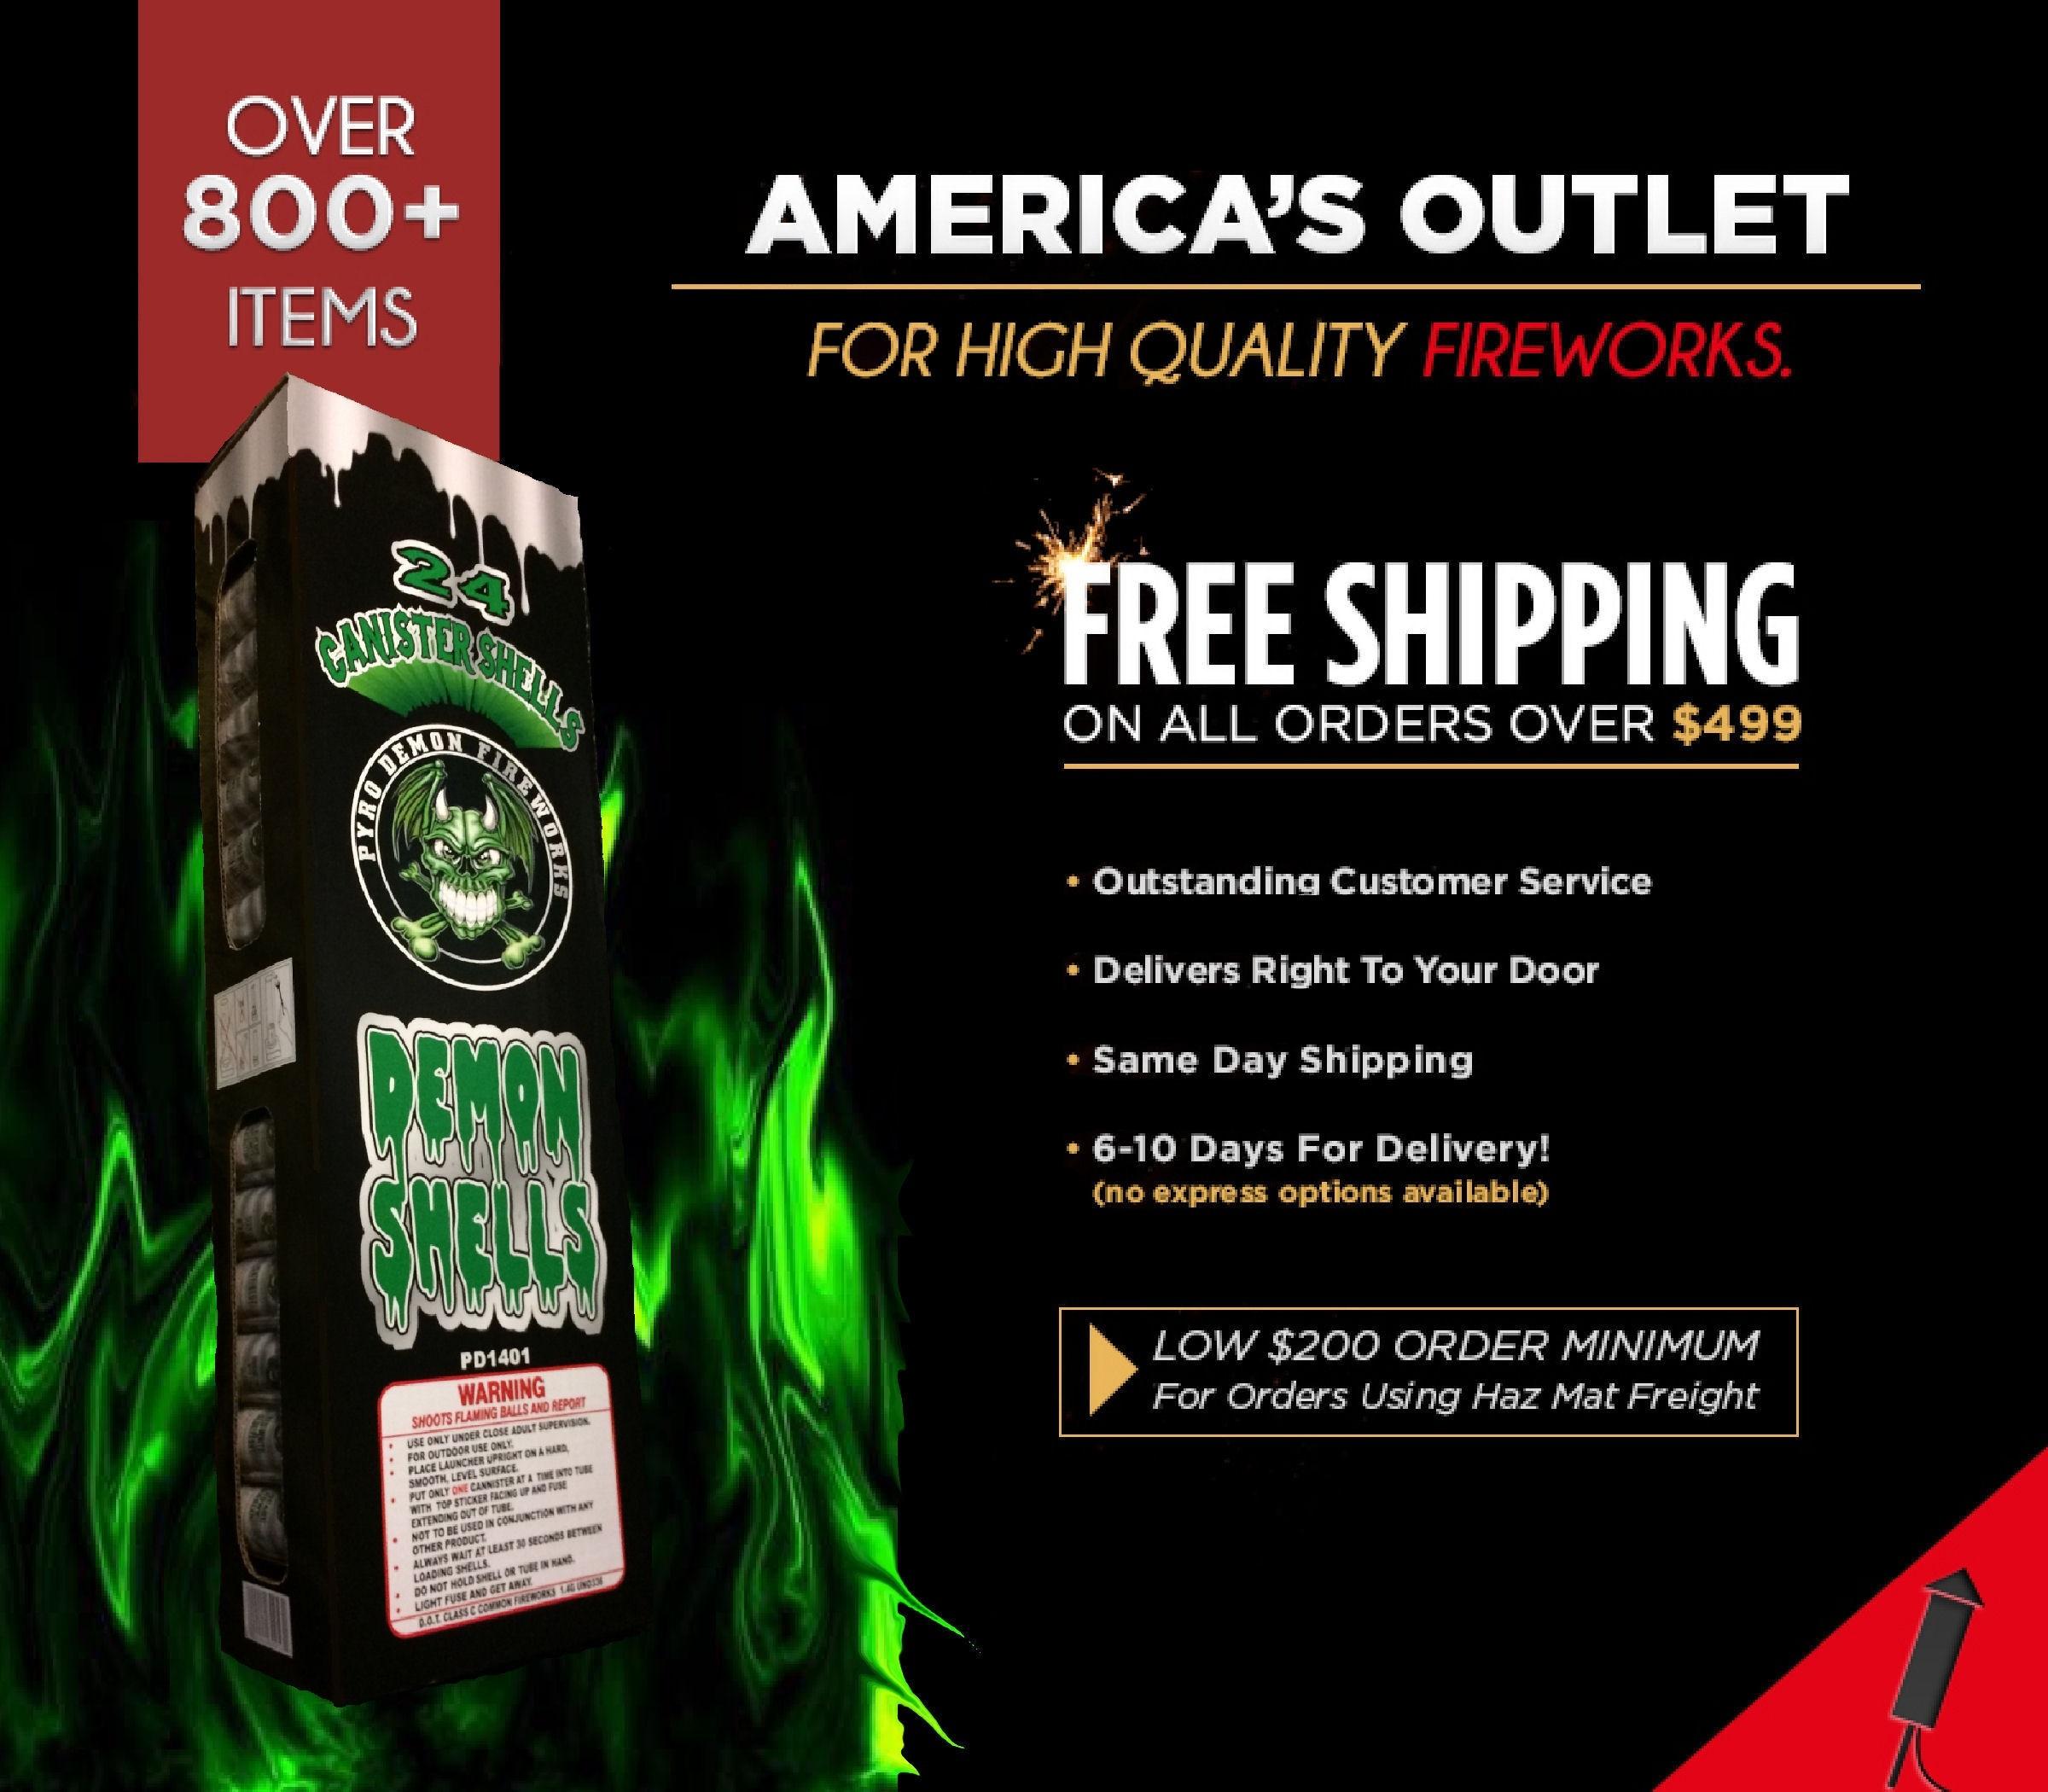 ocfireworks-home-page-banner.jpg